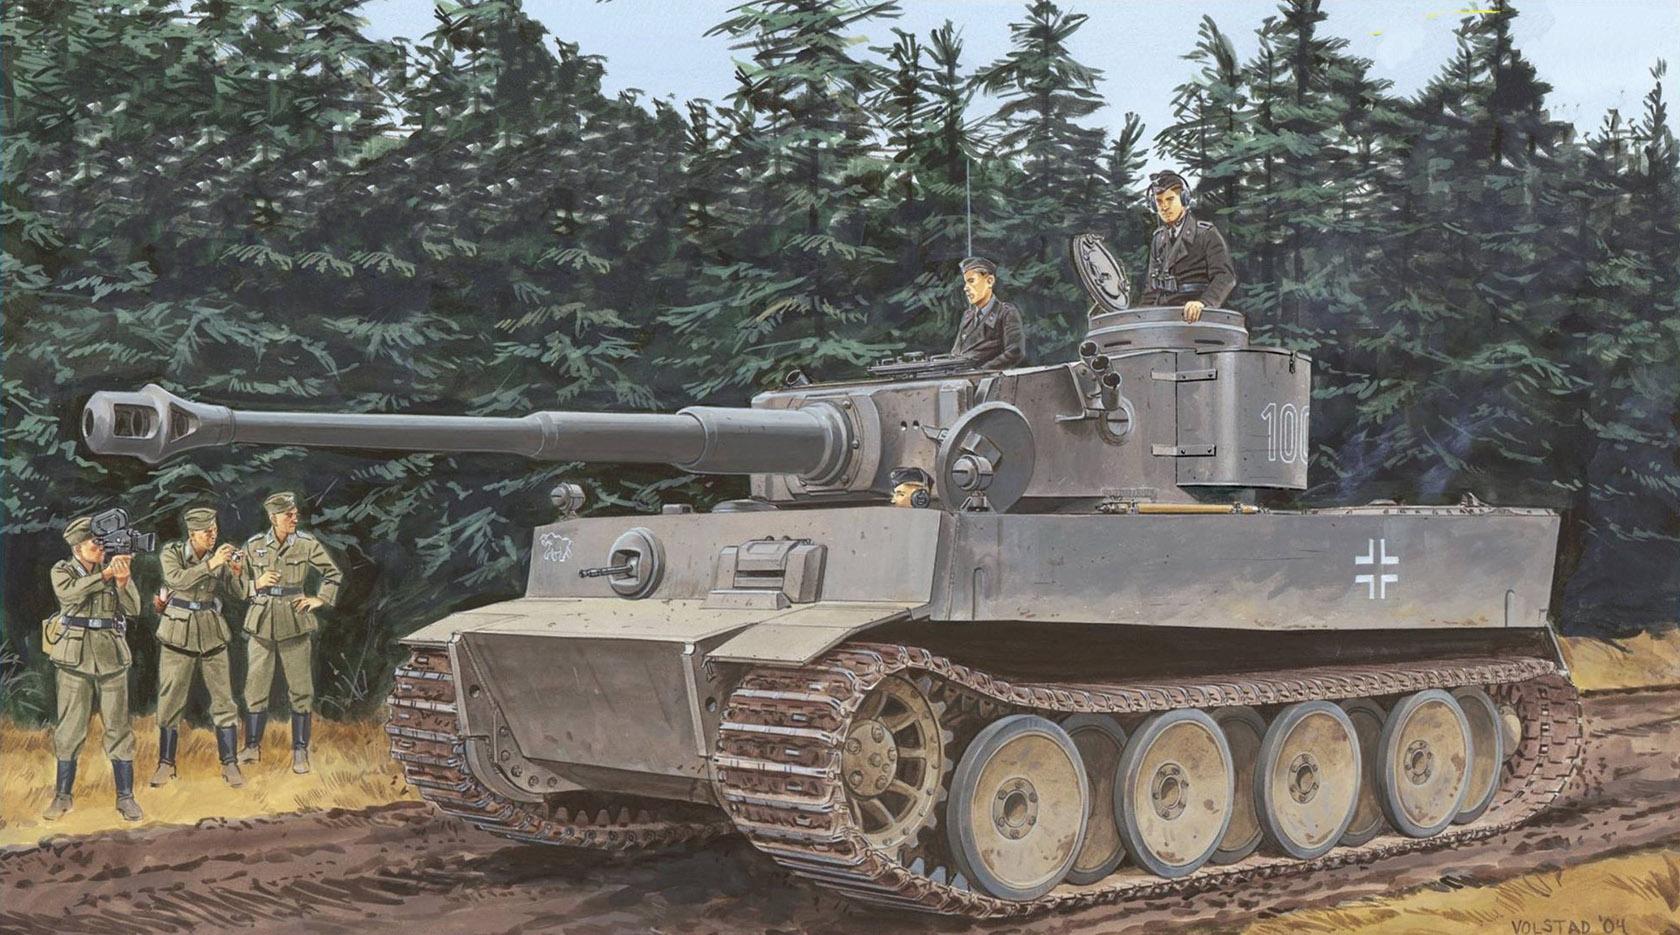 рисунок Pz.Kpfw.VI Ausf.E Tiger I Initial Production